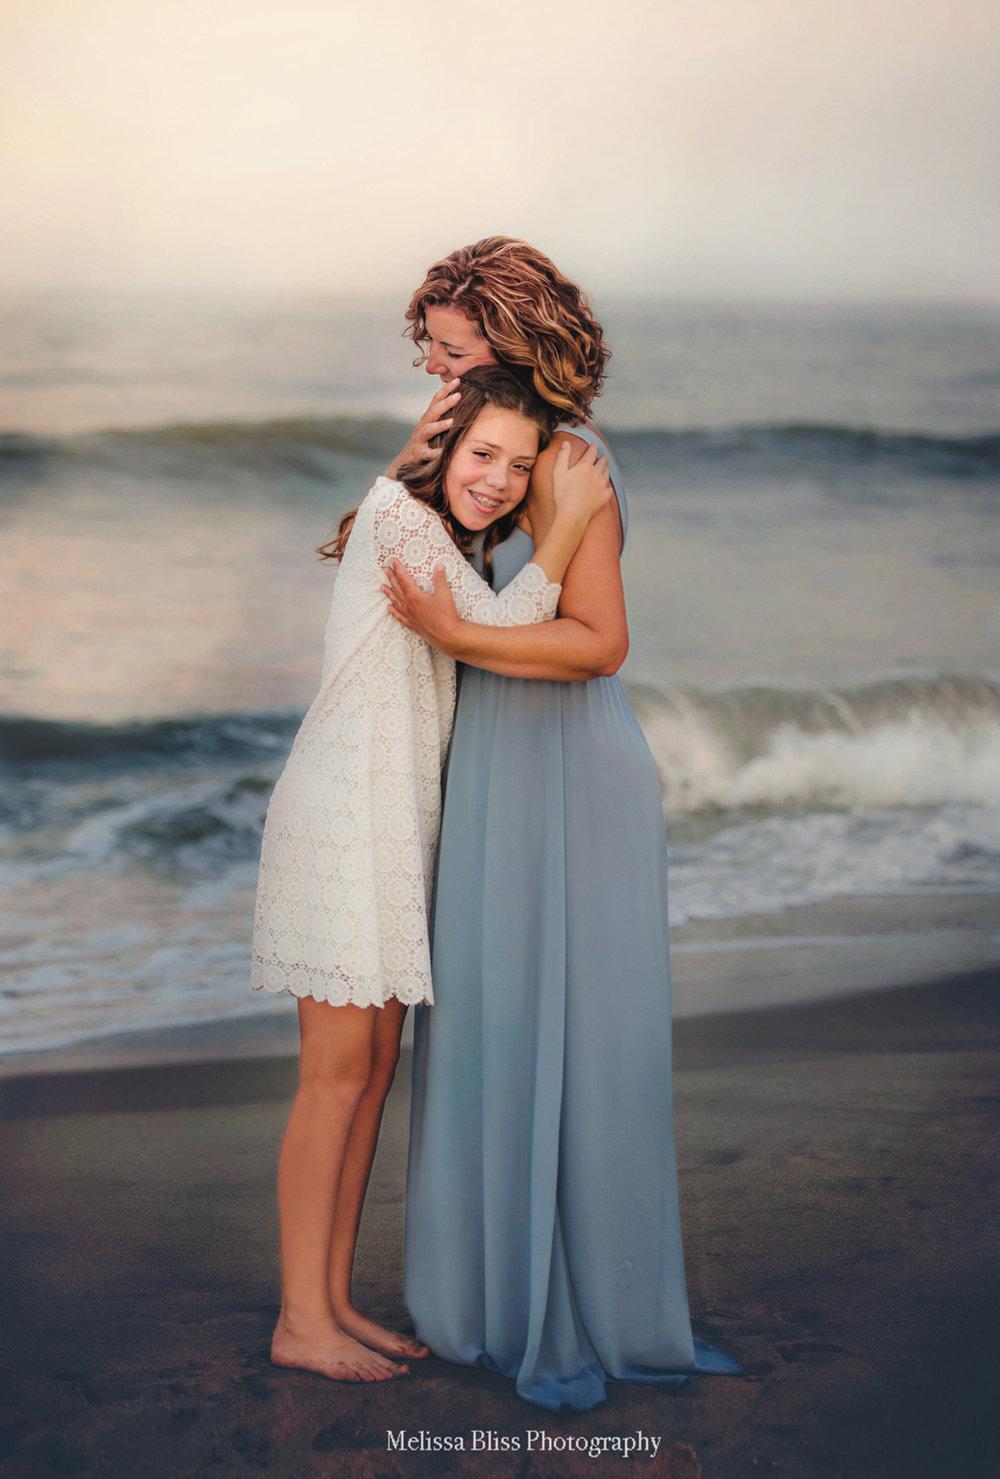 melissa-bliss-photography-creative-emotive-family-photography-virginia-beach-williamsburg-norfolk-richmond-photographer.jpg